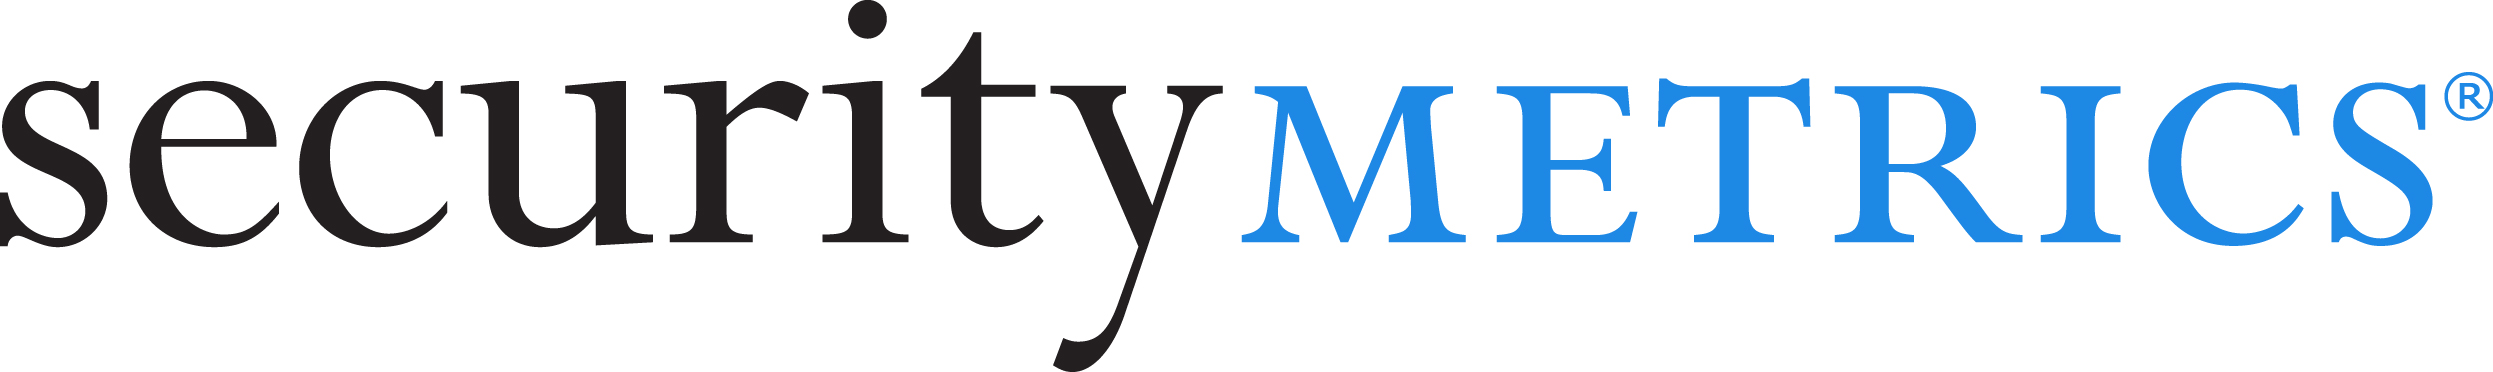 SecurityMetrics logo 2016